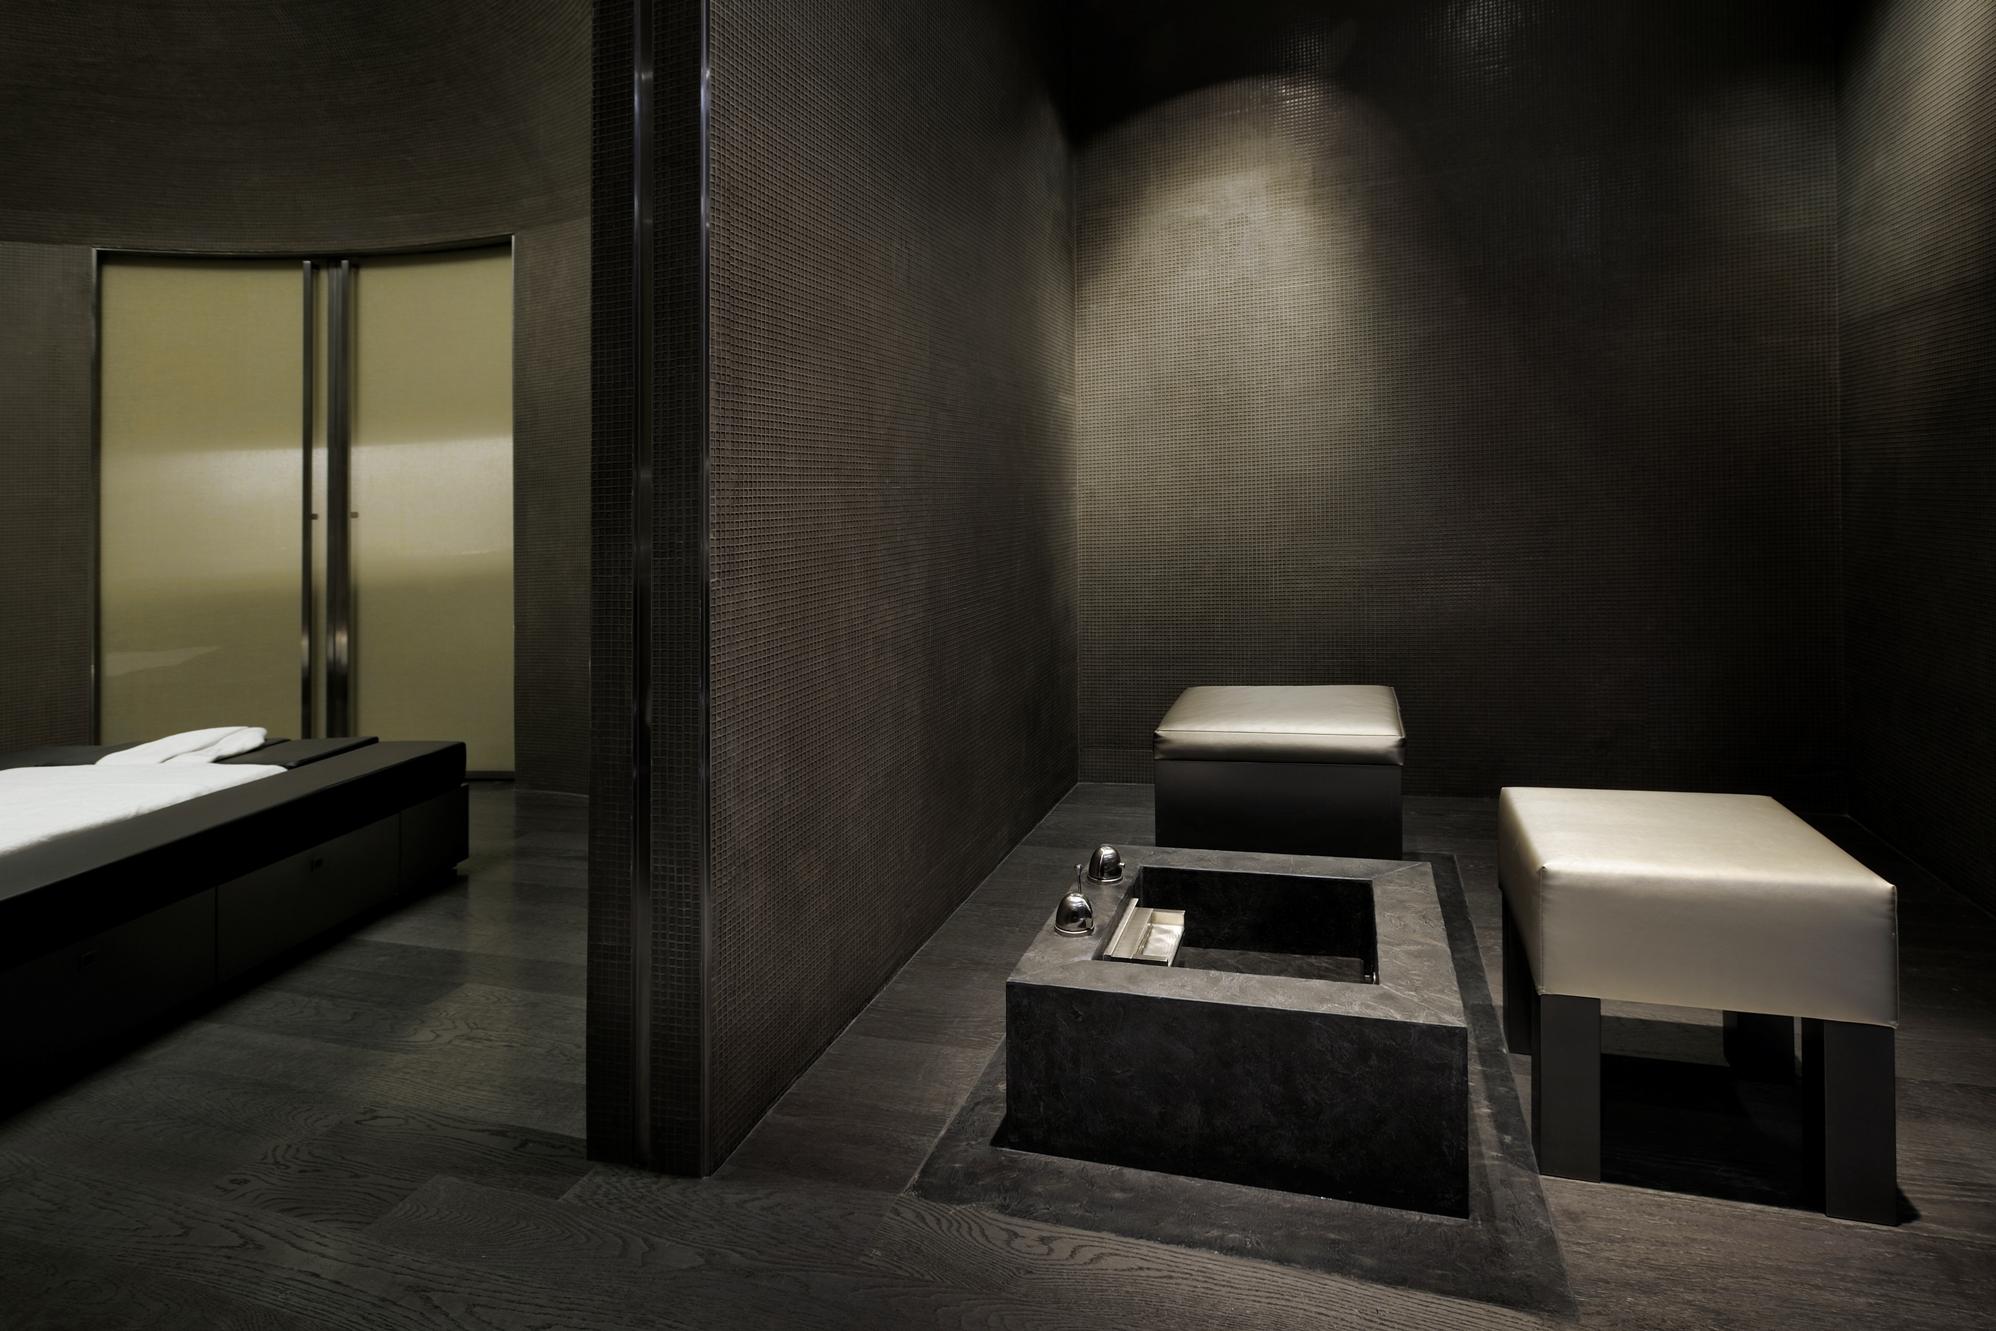 Armani Spa - Signature Suite2